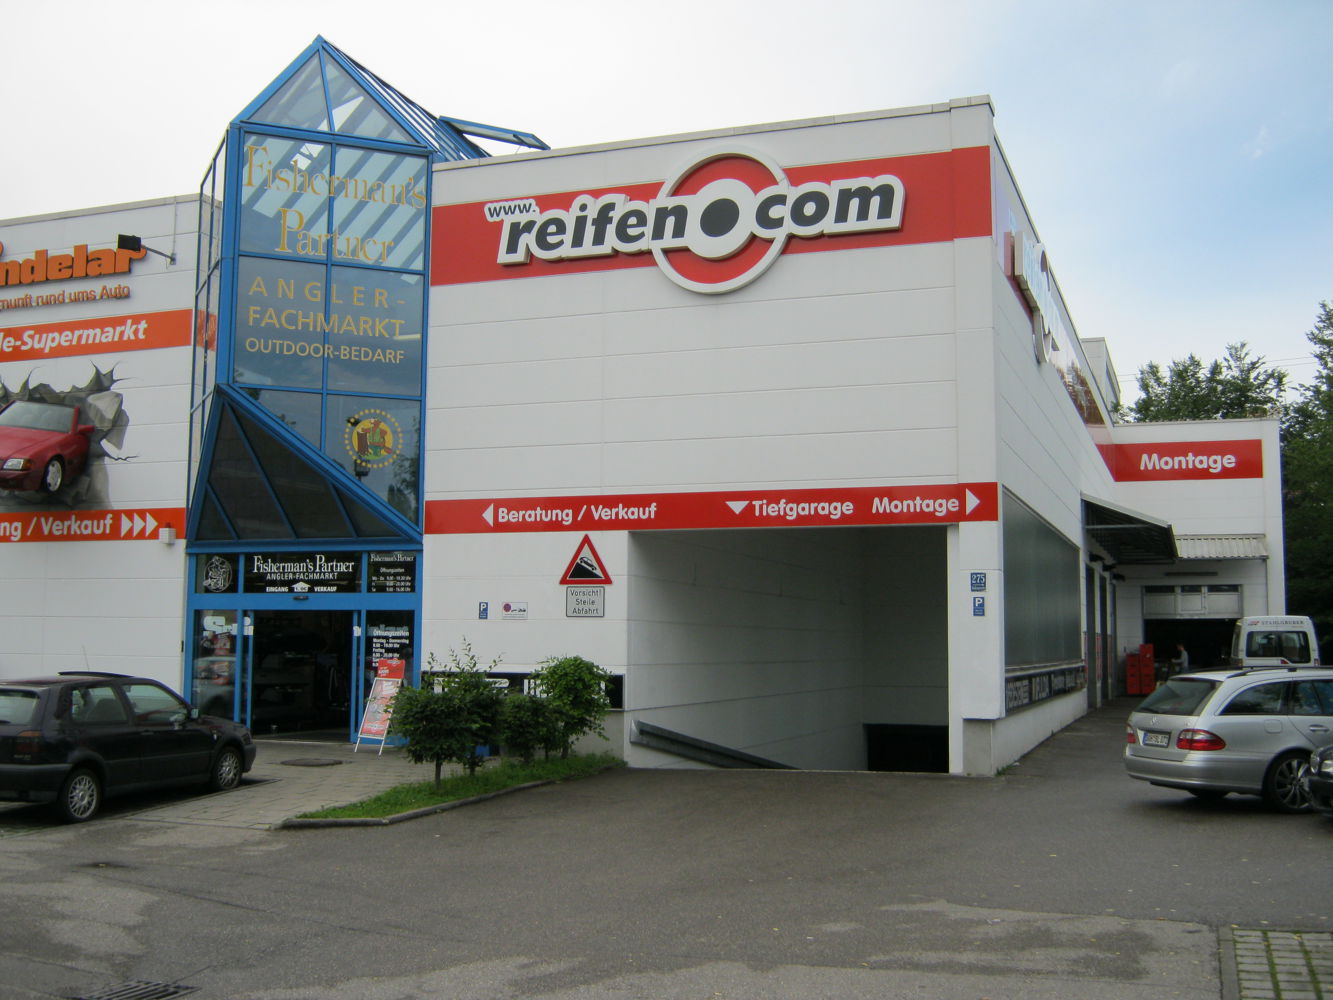 reifen.com-Filiale in München Aubing